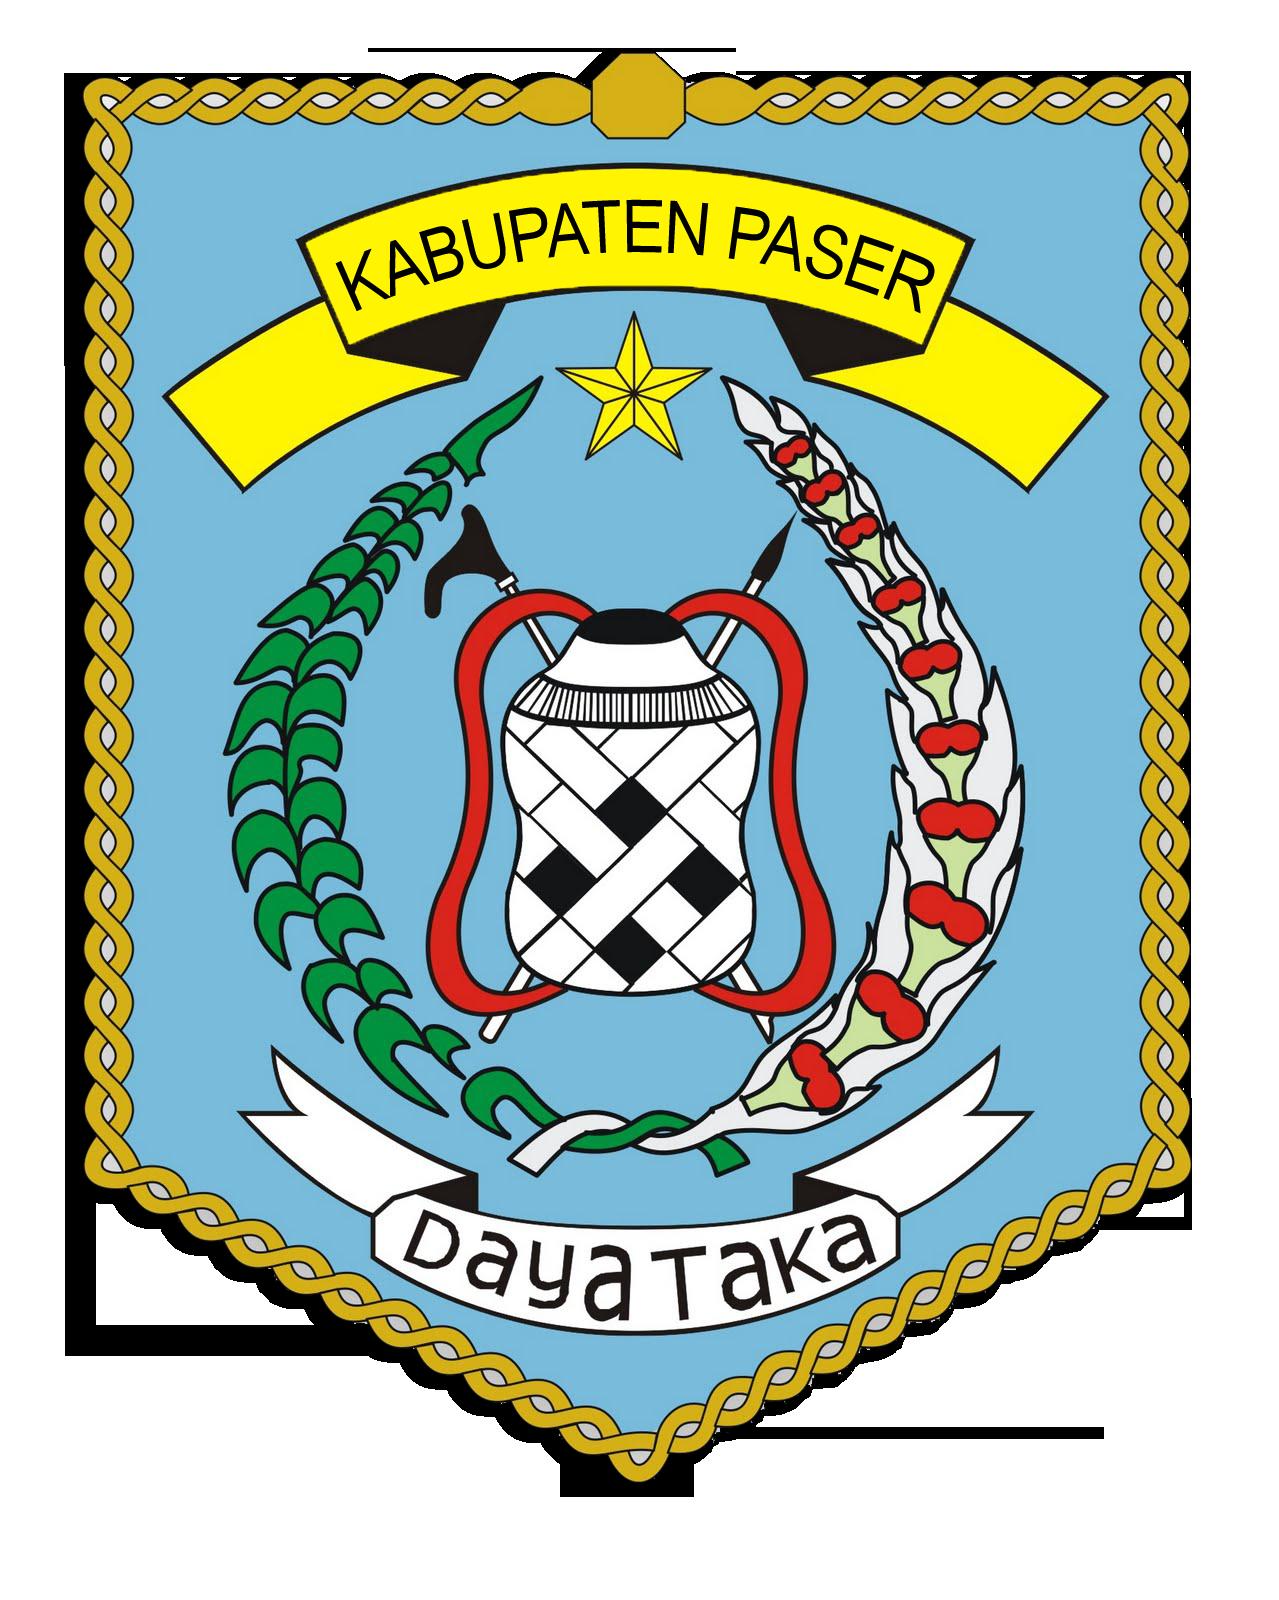 Pin De Mulyadi Kombih Em Logo Indonesia Brasao Bandeiras